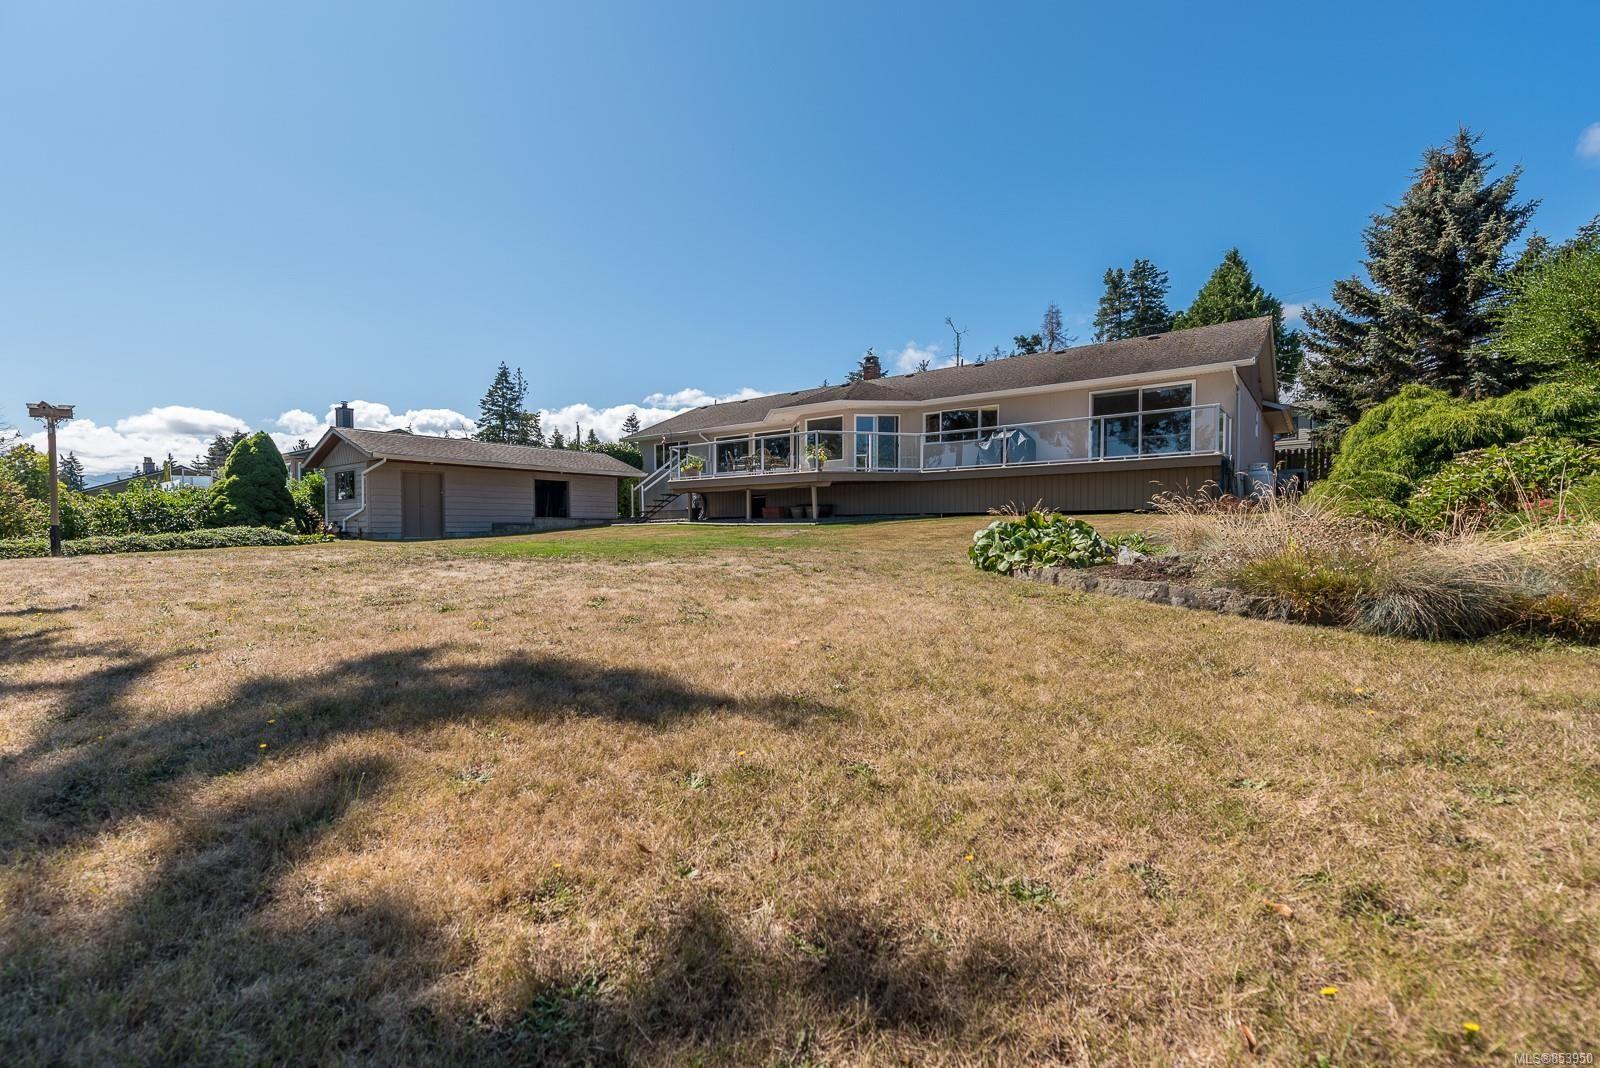 Photo 37: Photos: 5880 GARVIN Rd in : CV Union Bay/Fanny Bay House for sale (Comox Valley)  : MLS®# 853950